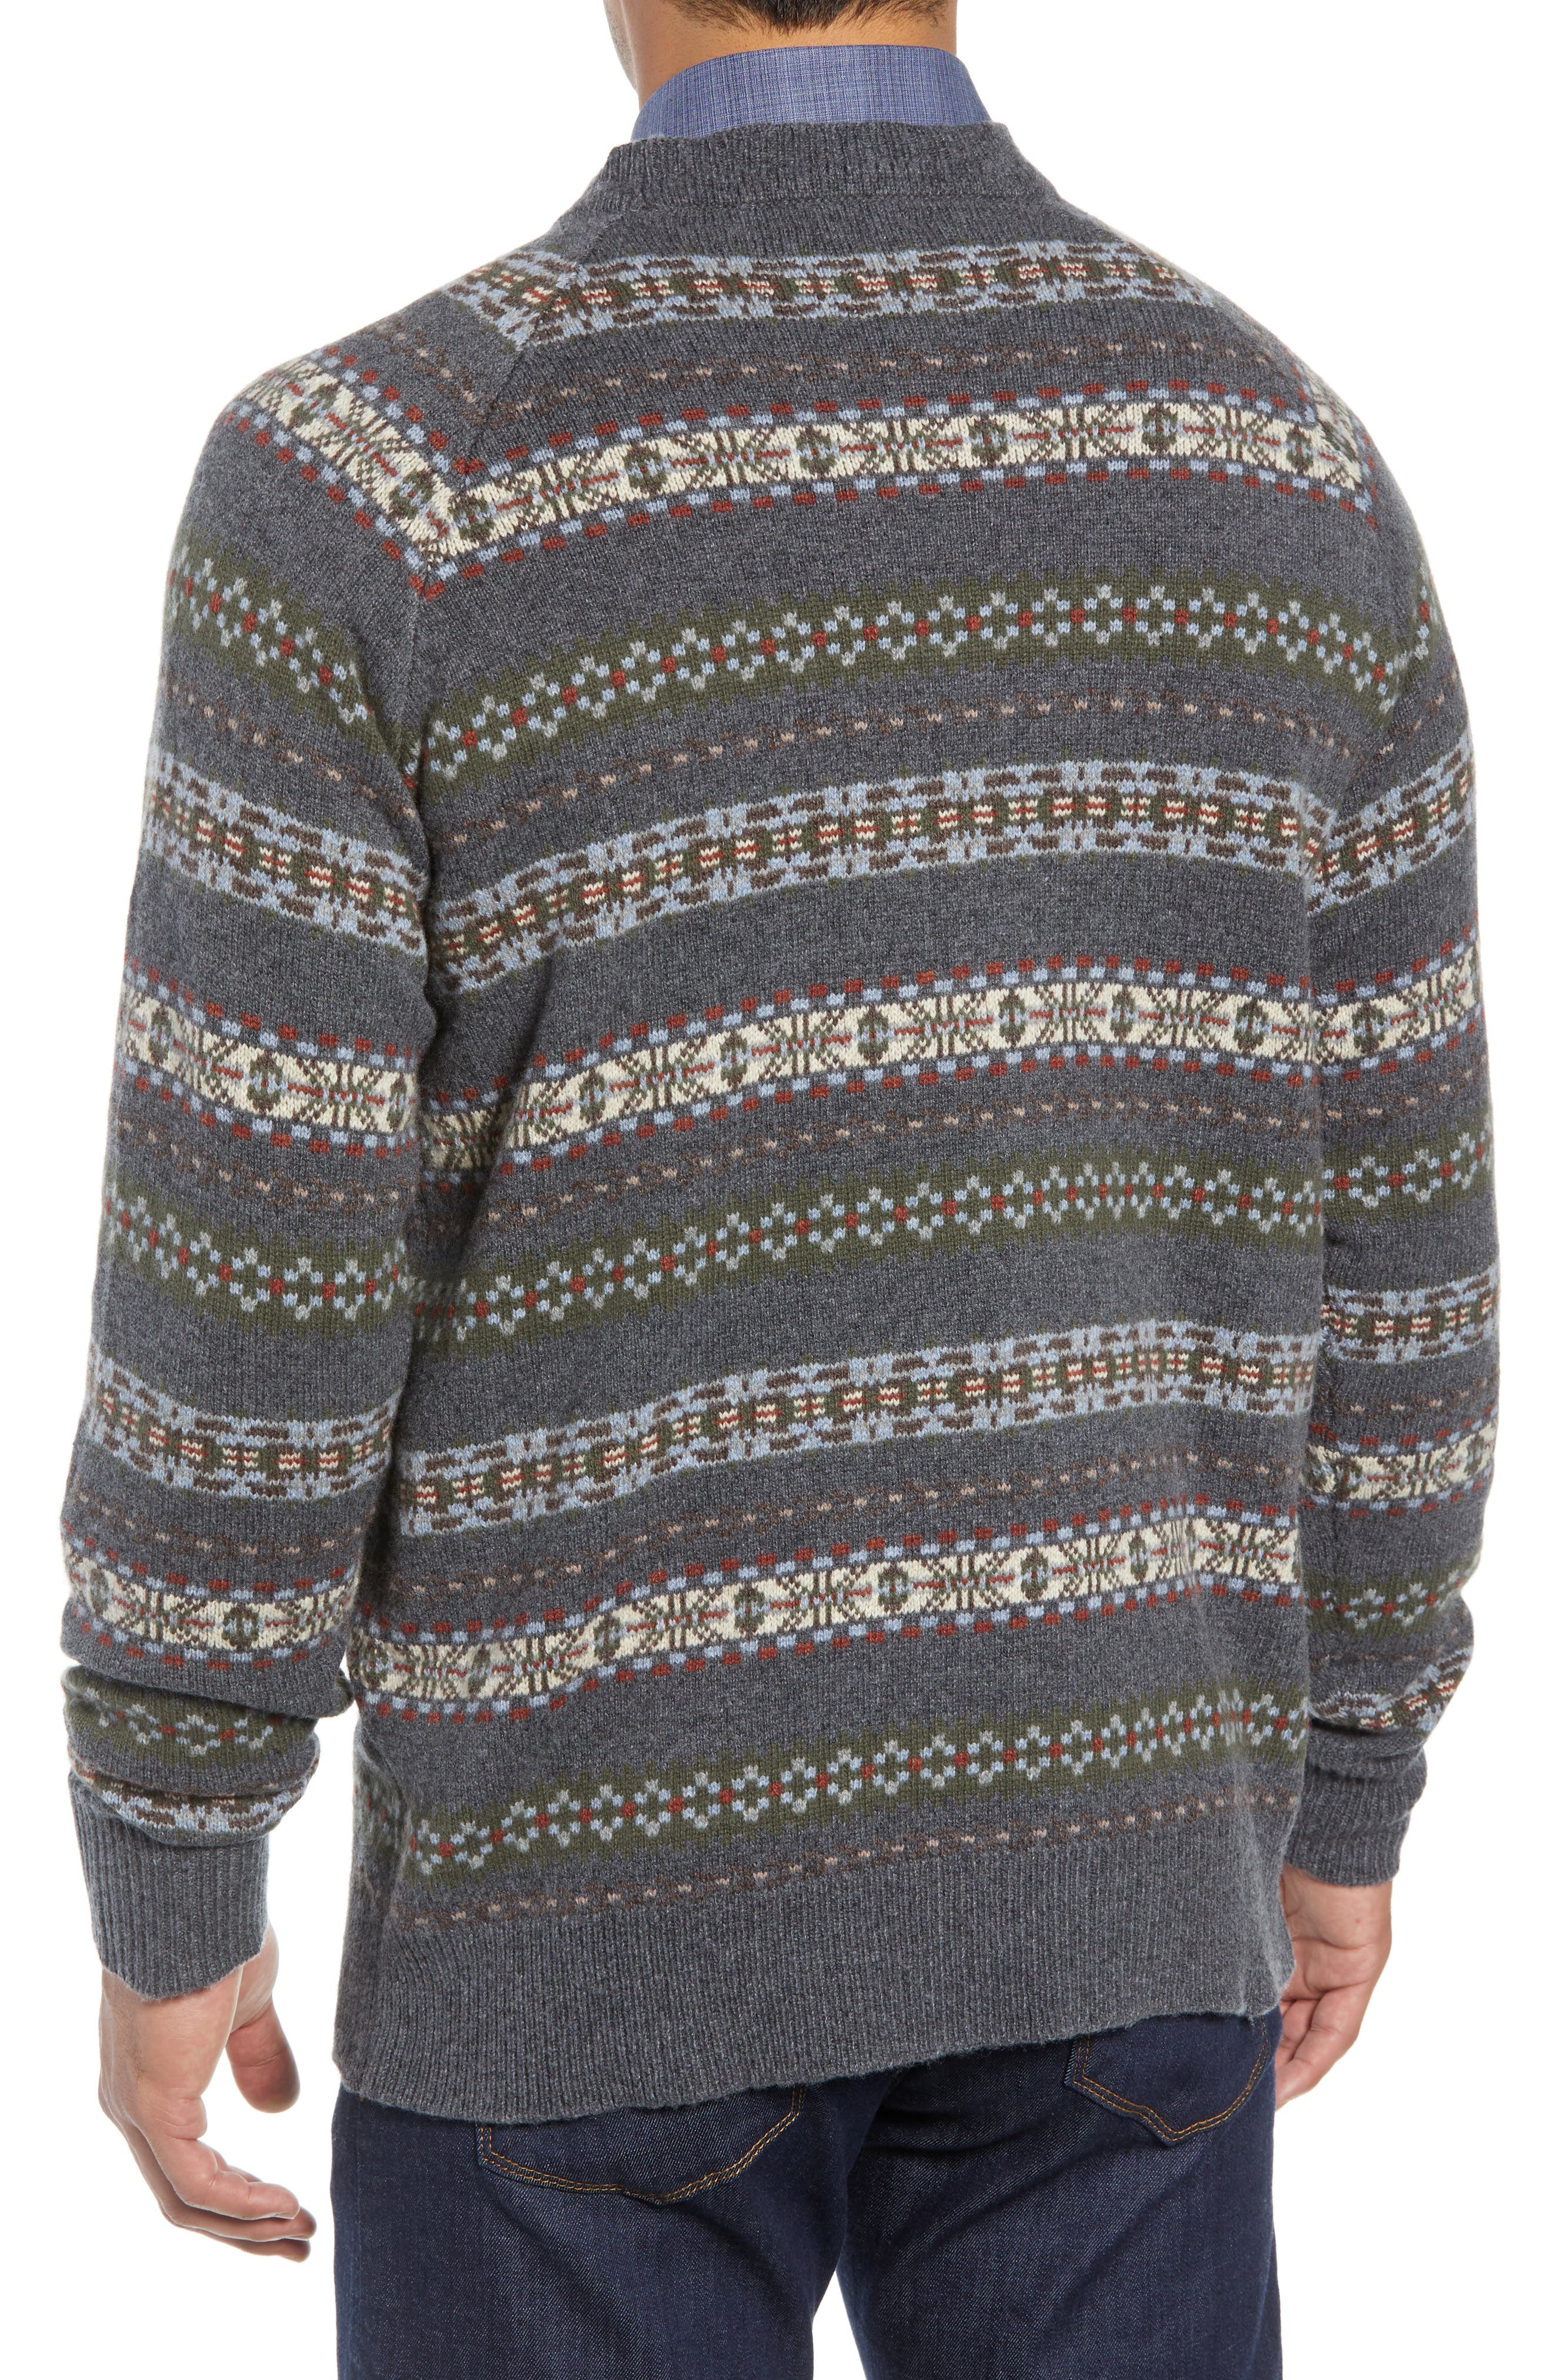 Mountainside Fair Isle Crewneck Sweater,                             Alternate thumbnail 2, color,                             017